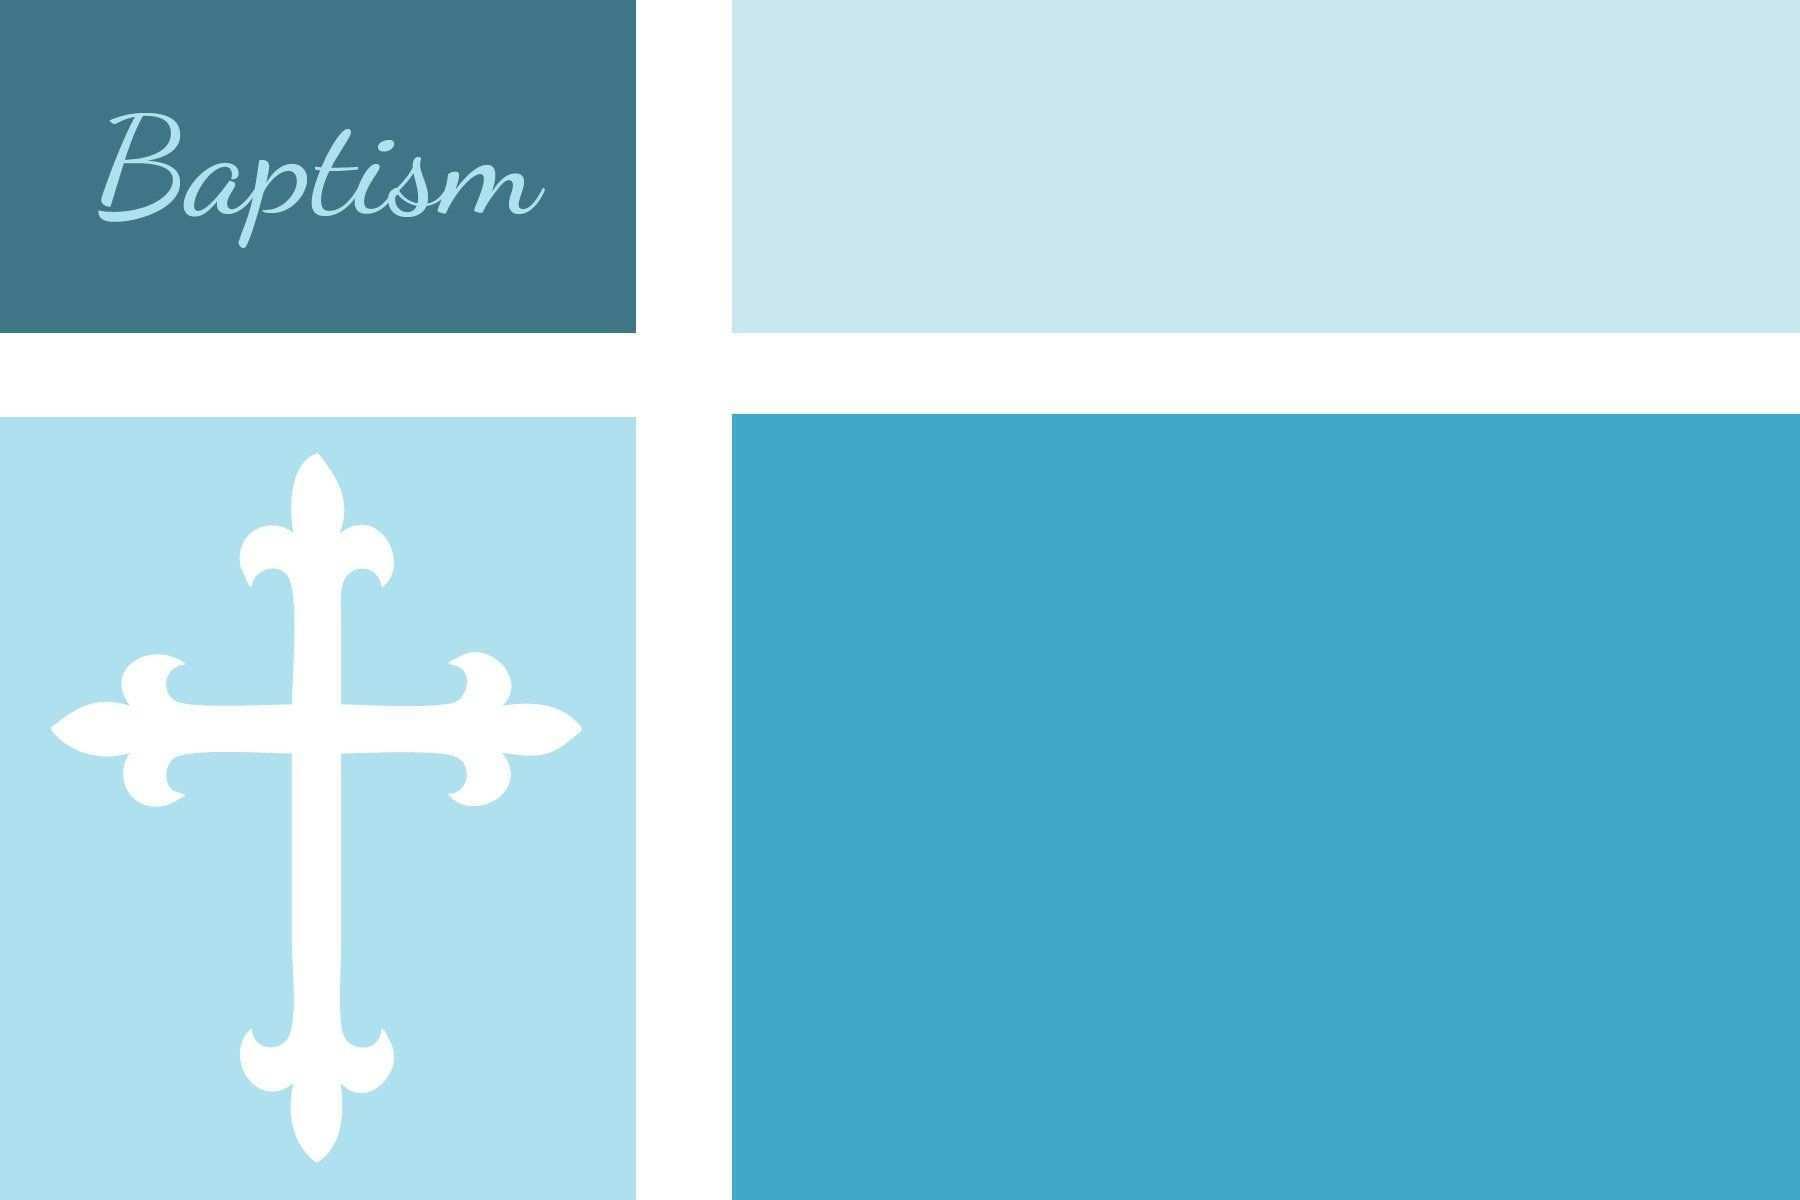 40 Visiting Blank Invitation Templates For Christening for Ms Word by Blank Invitation Templates For Christening